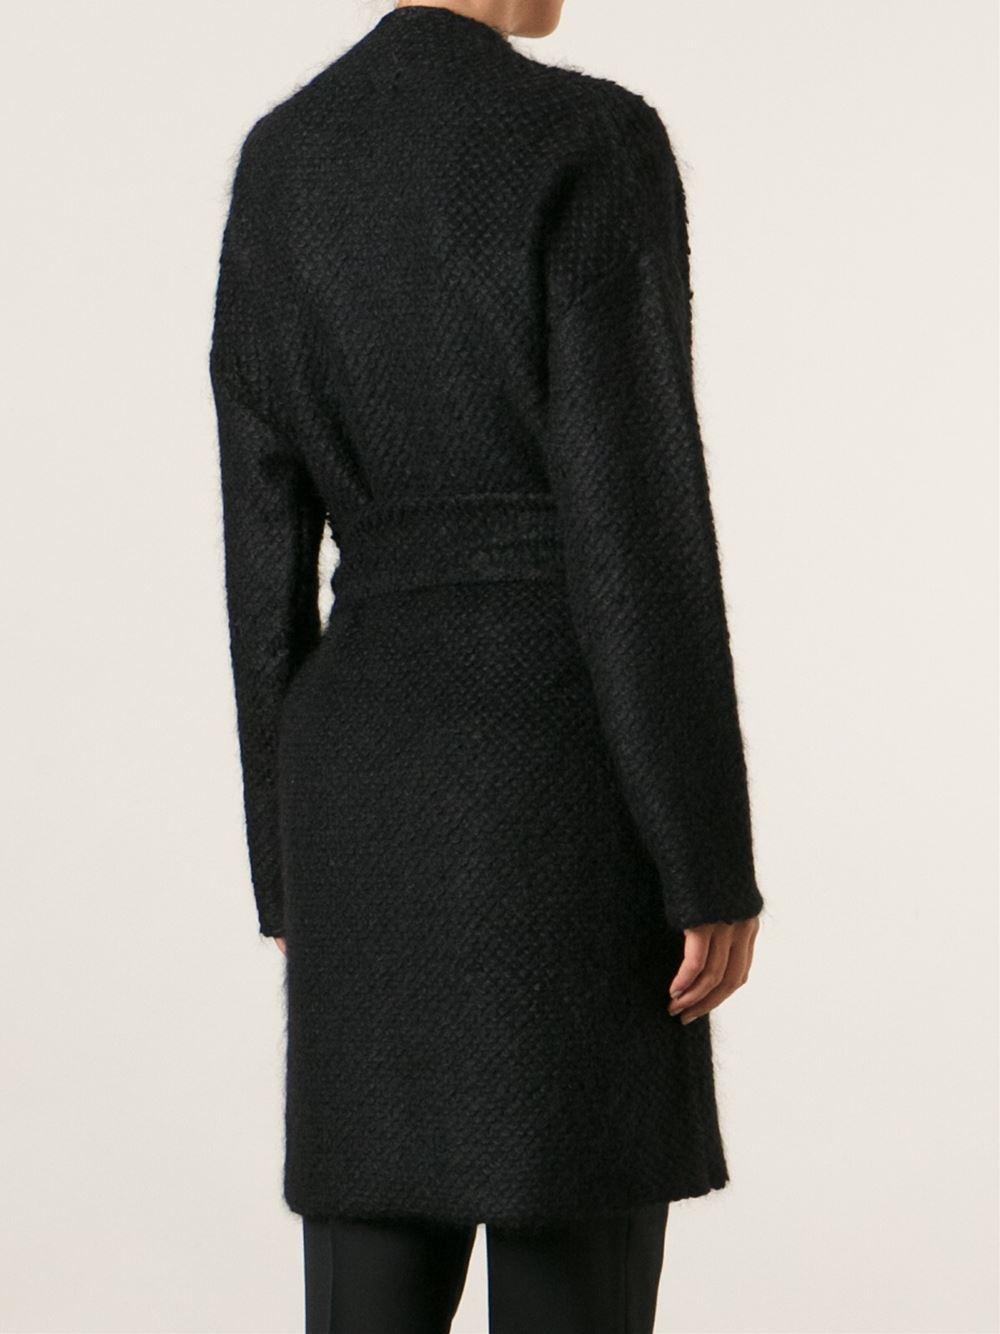 lyst vanessa bruno ath robe style coat in black. Black Bedroom Furniture Sets. Home Design Ideas